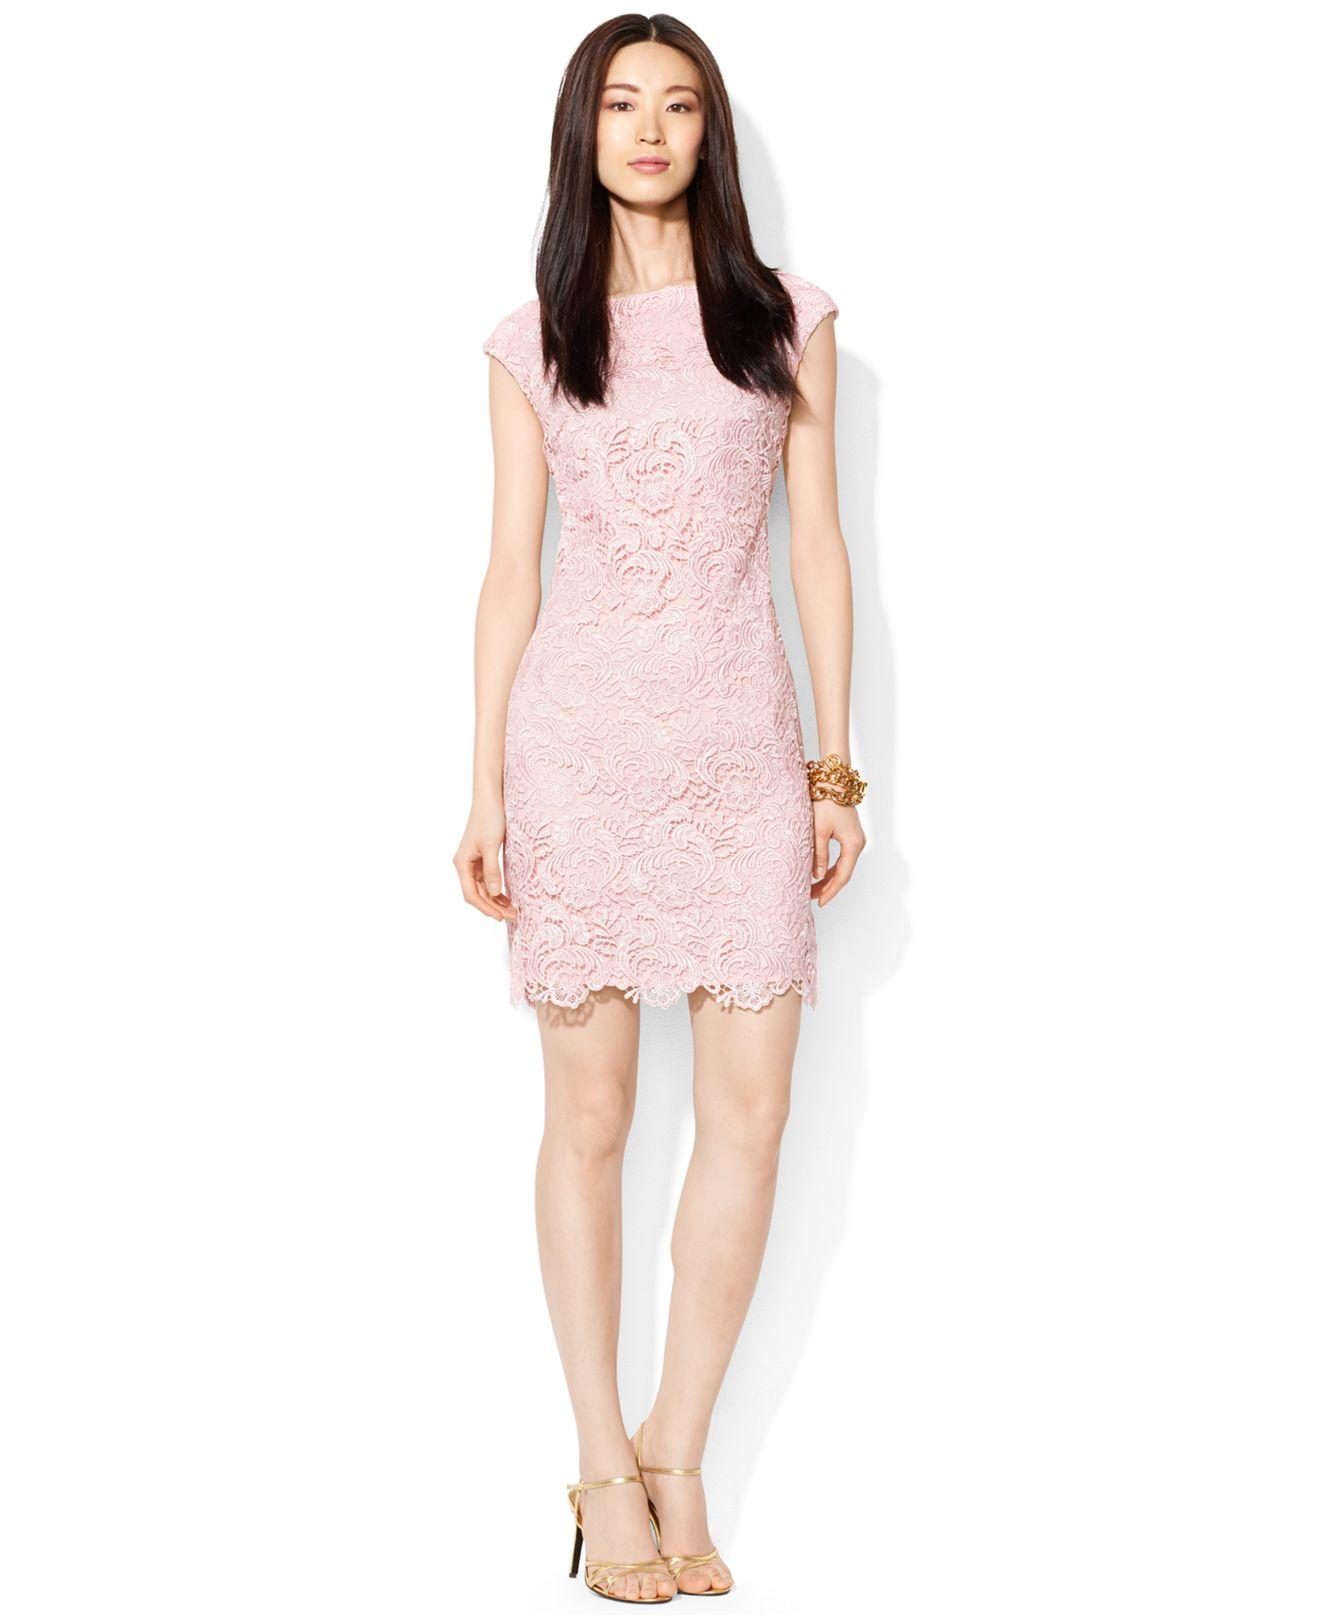 ce892b7f8758 Lauren by Ralph Lauren Cap-Sleeve Crocheted Lace Dress in Pink - Lyst